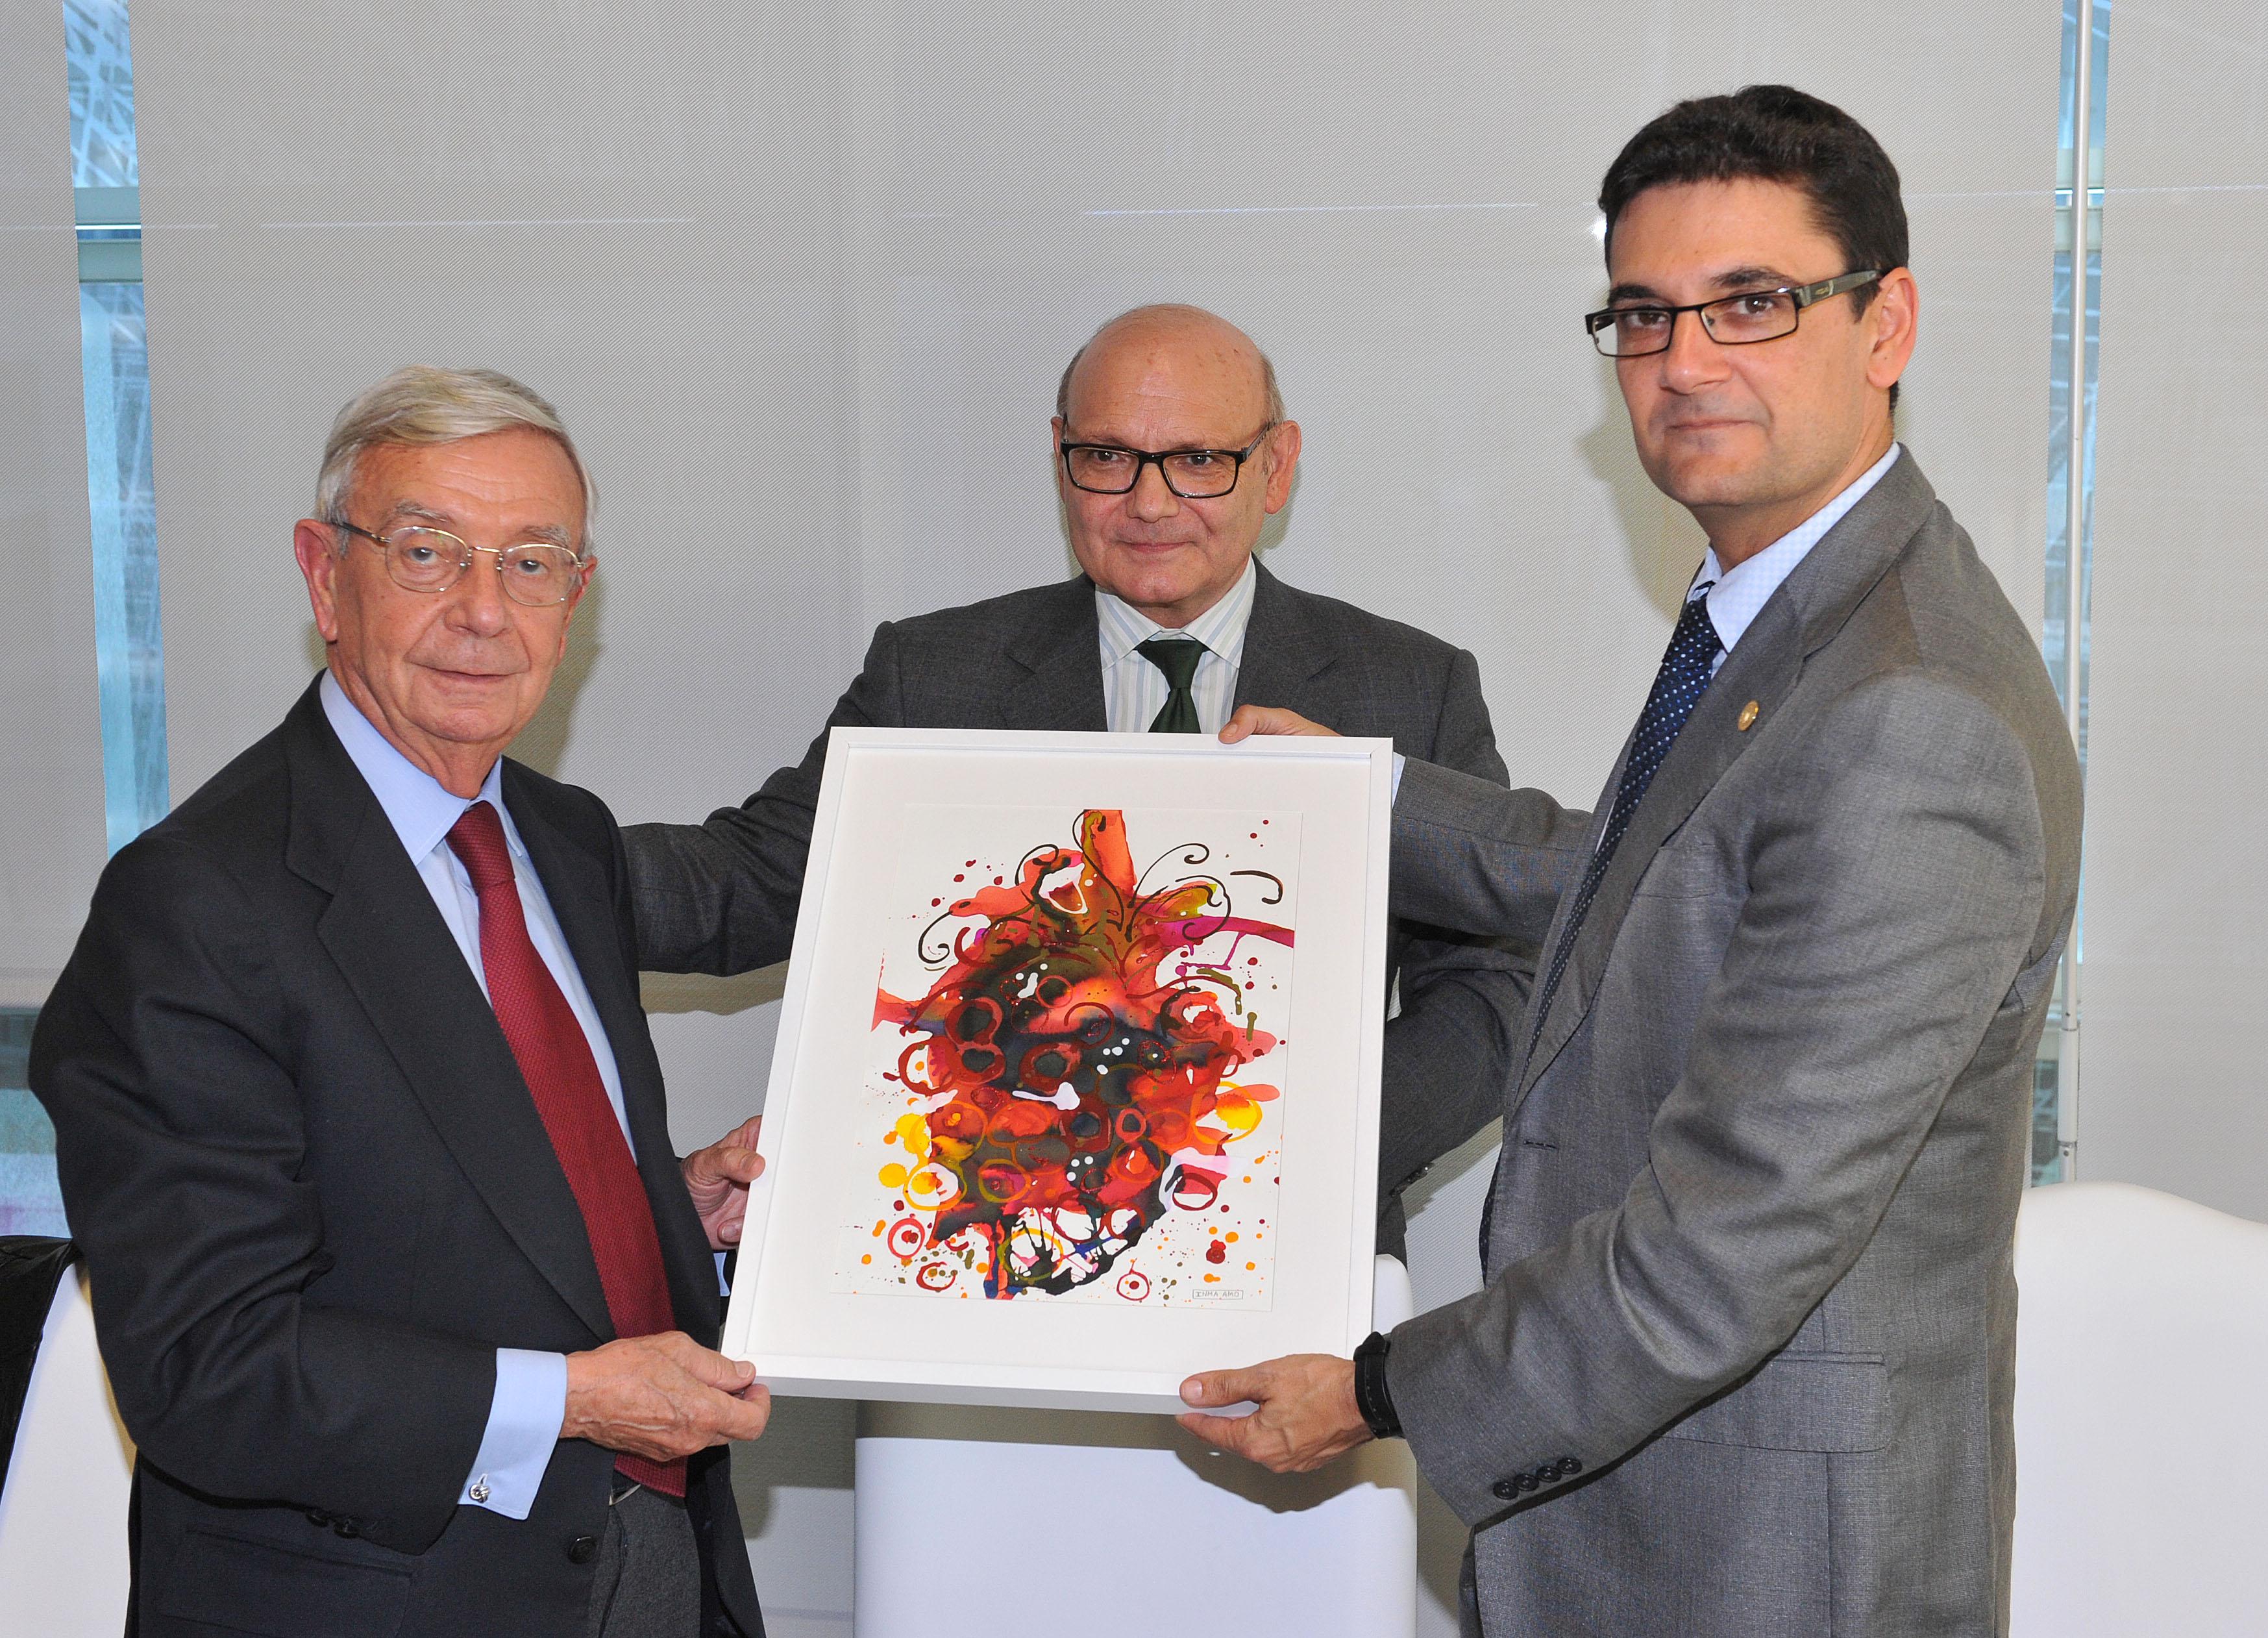 Cuadro primigenio obsequio a Rafael Ansón Oliart